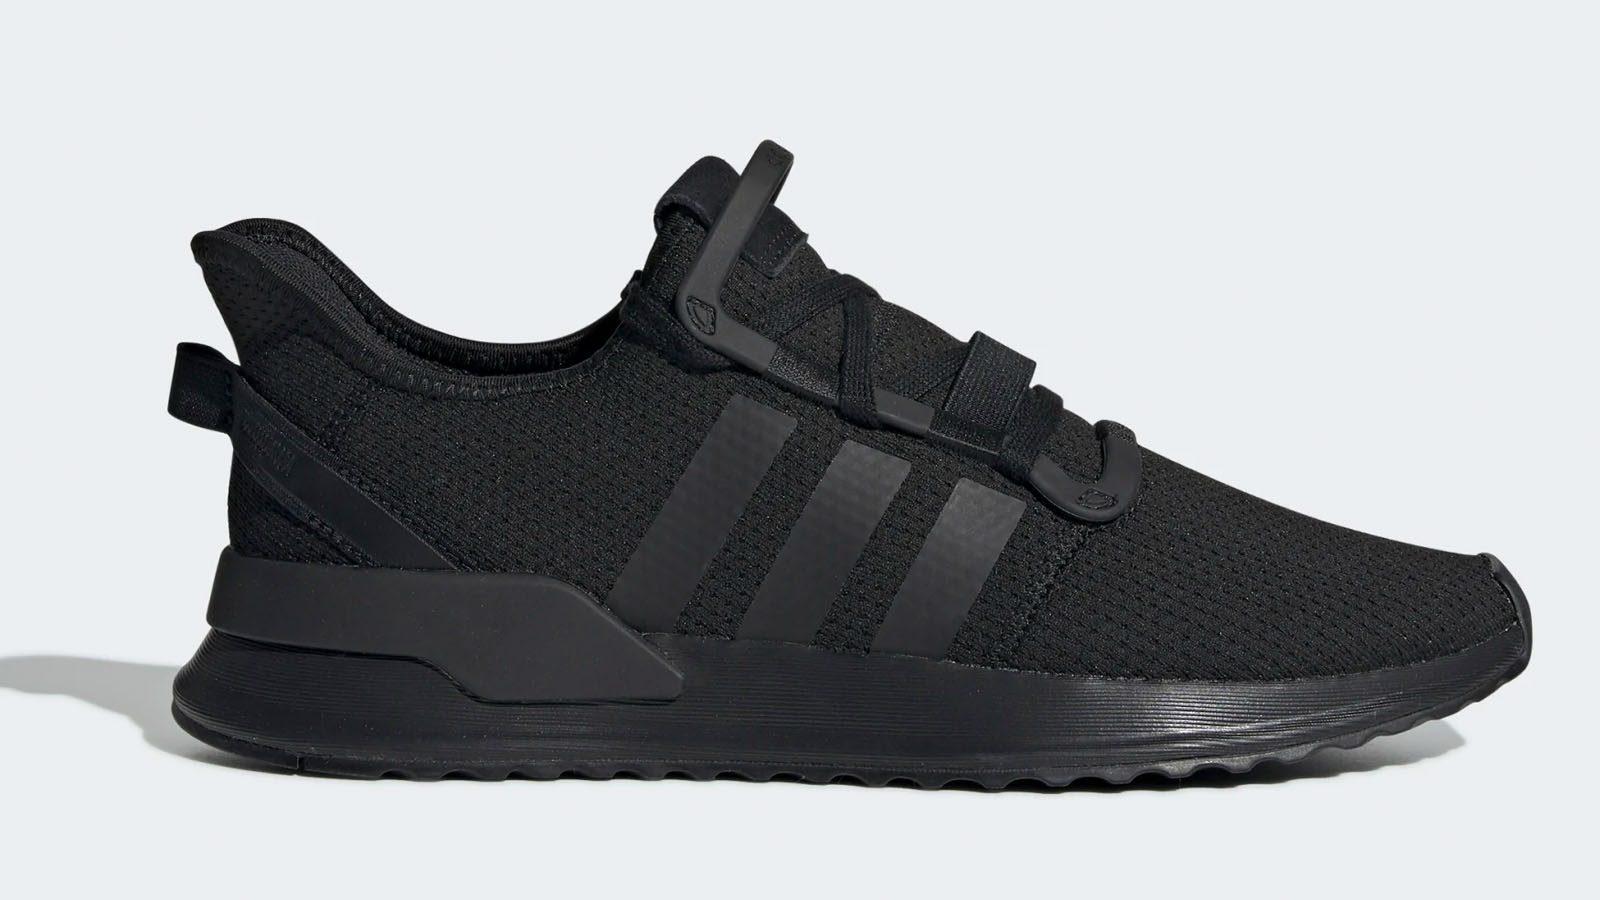 adidas listicle_0009_adidas path shoes